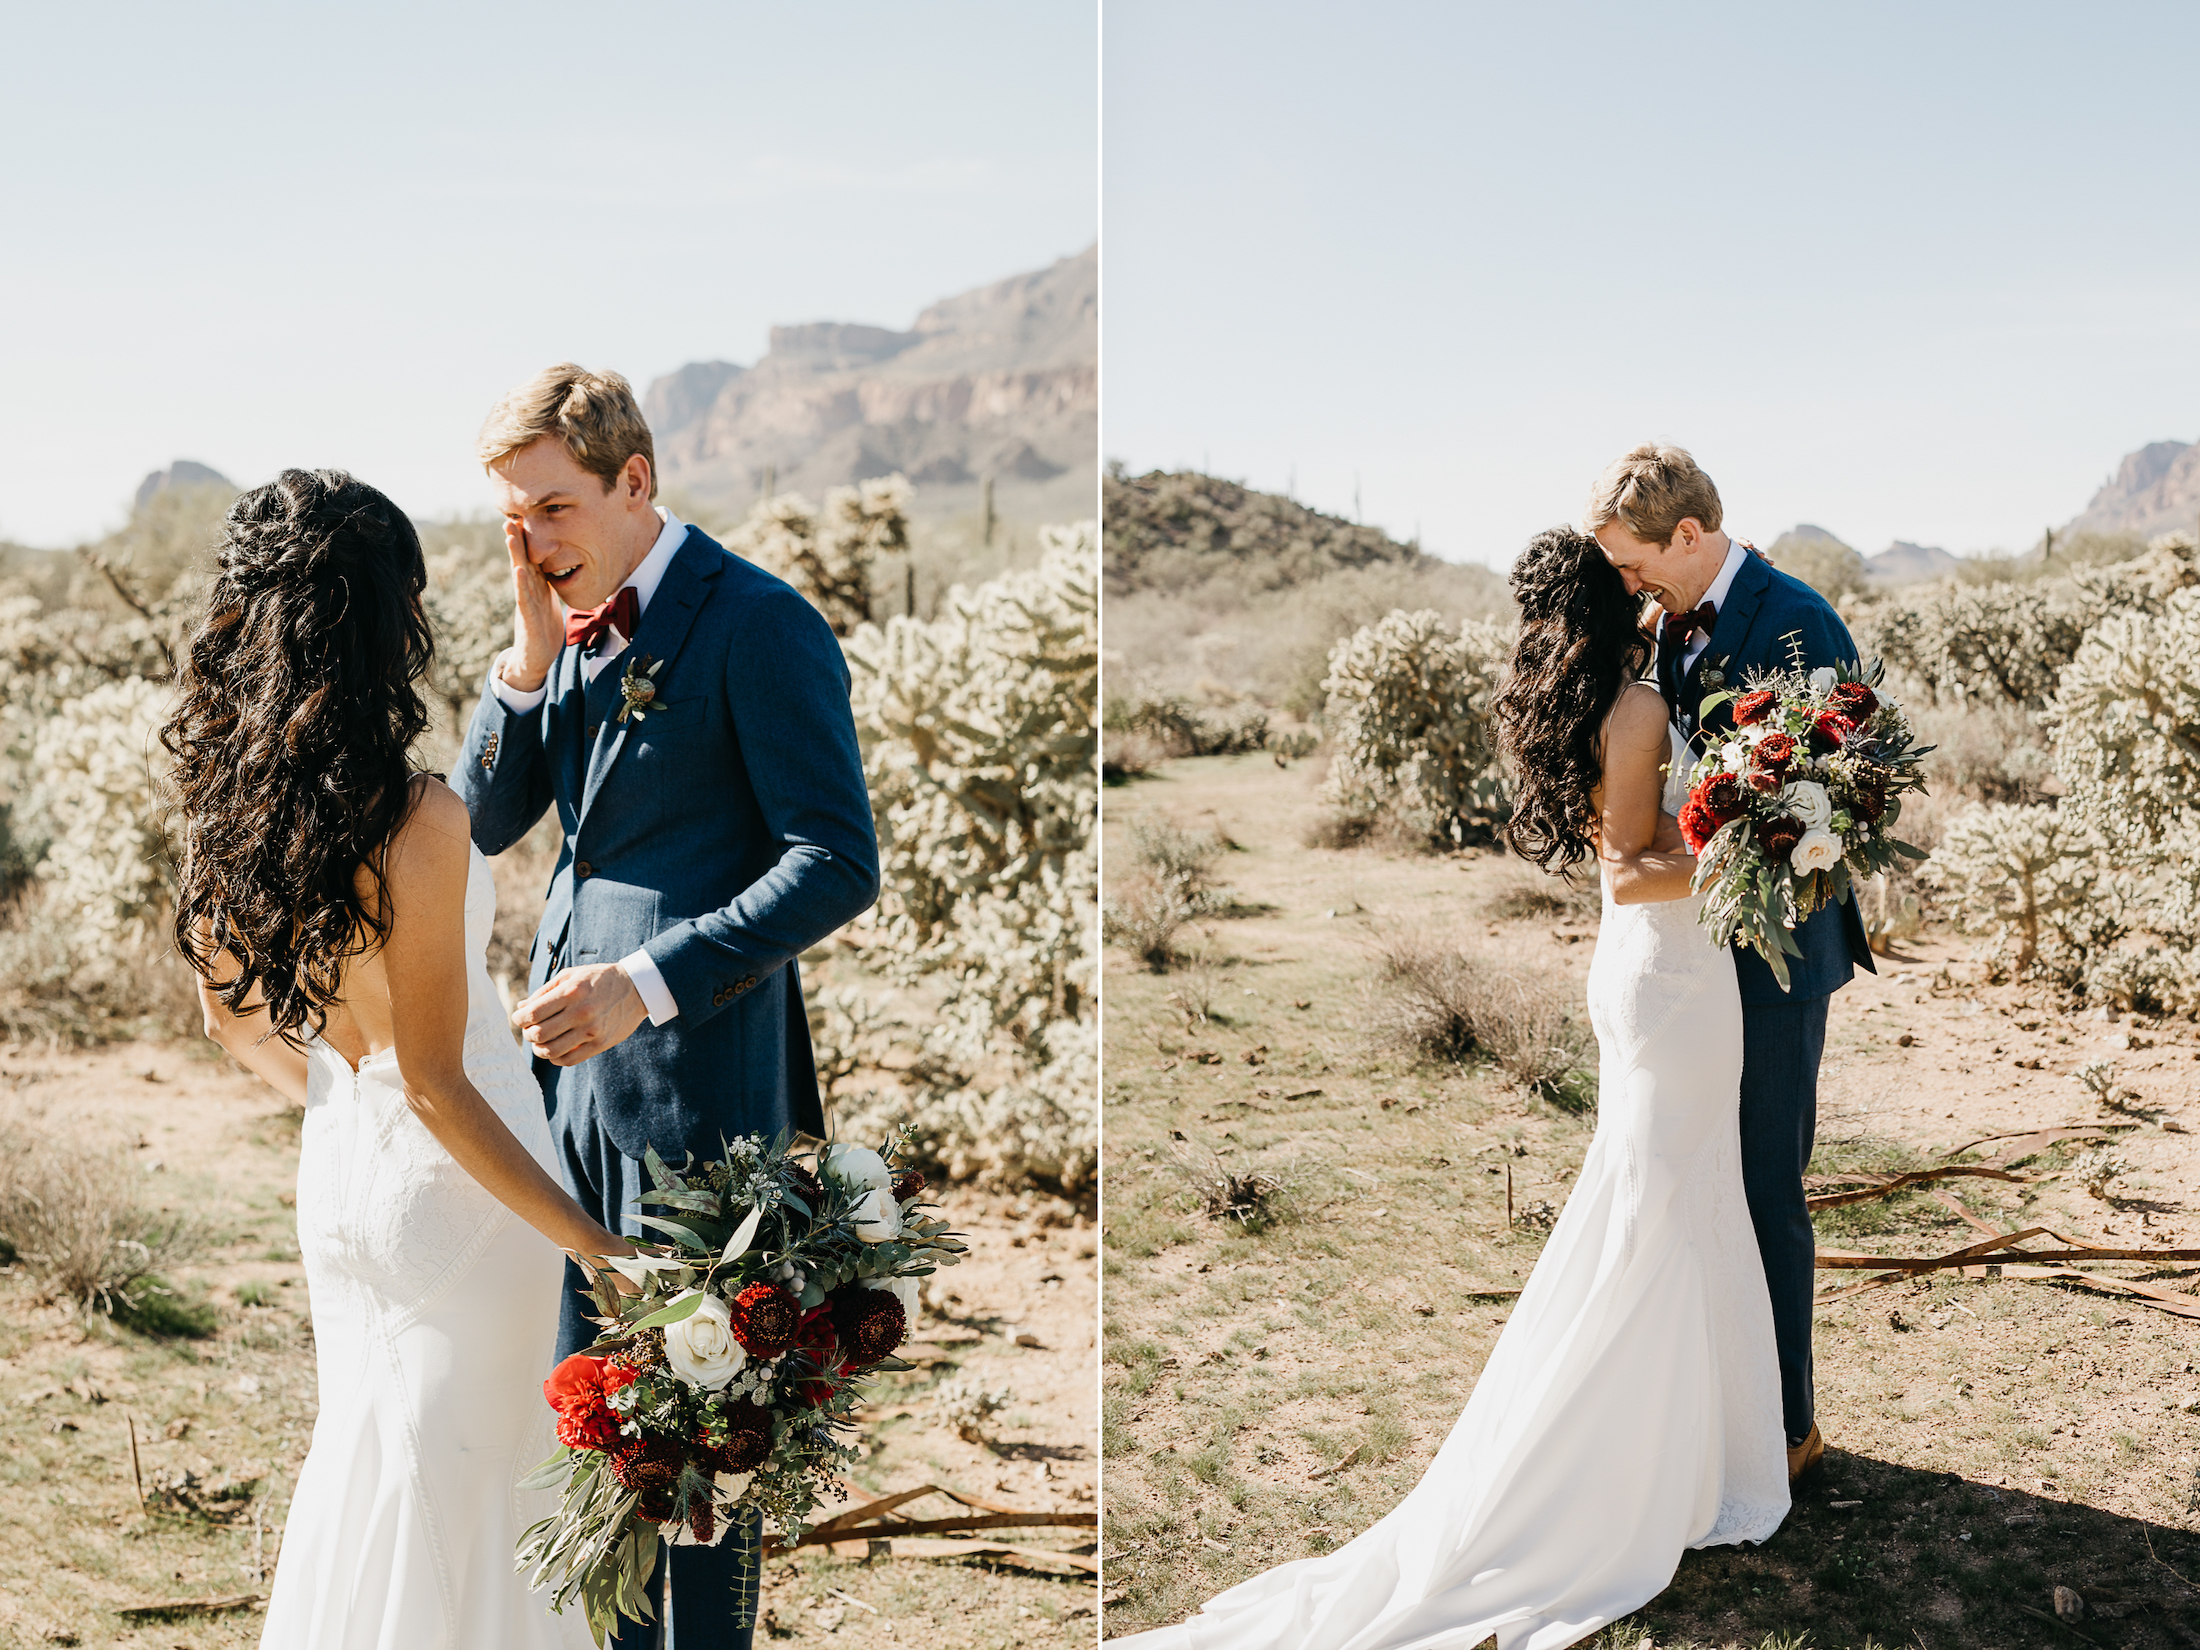 Supersition-mountain-wedding-photographer-arizona03.jpg